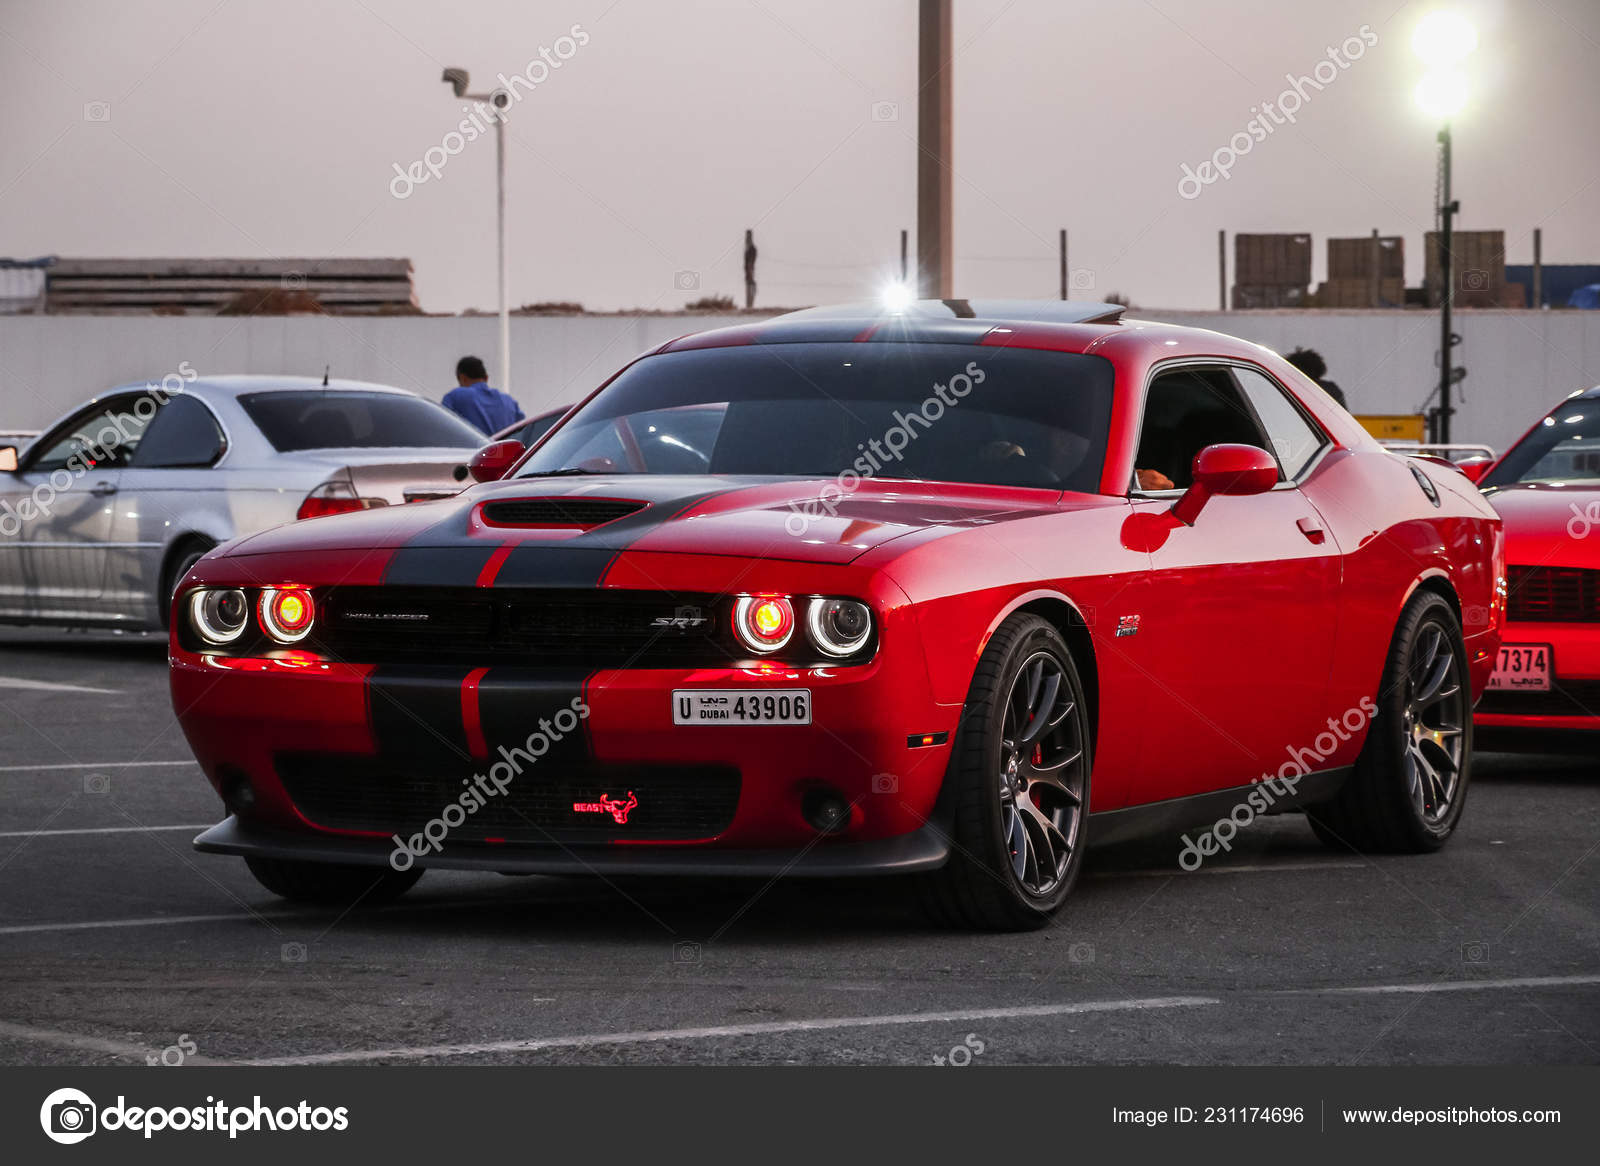 dubai vereinigte arabische emirate november 2018 muscle car dodge